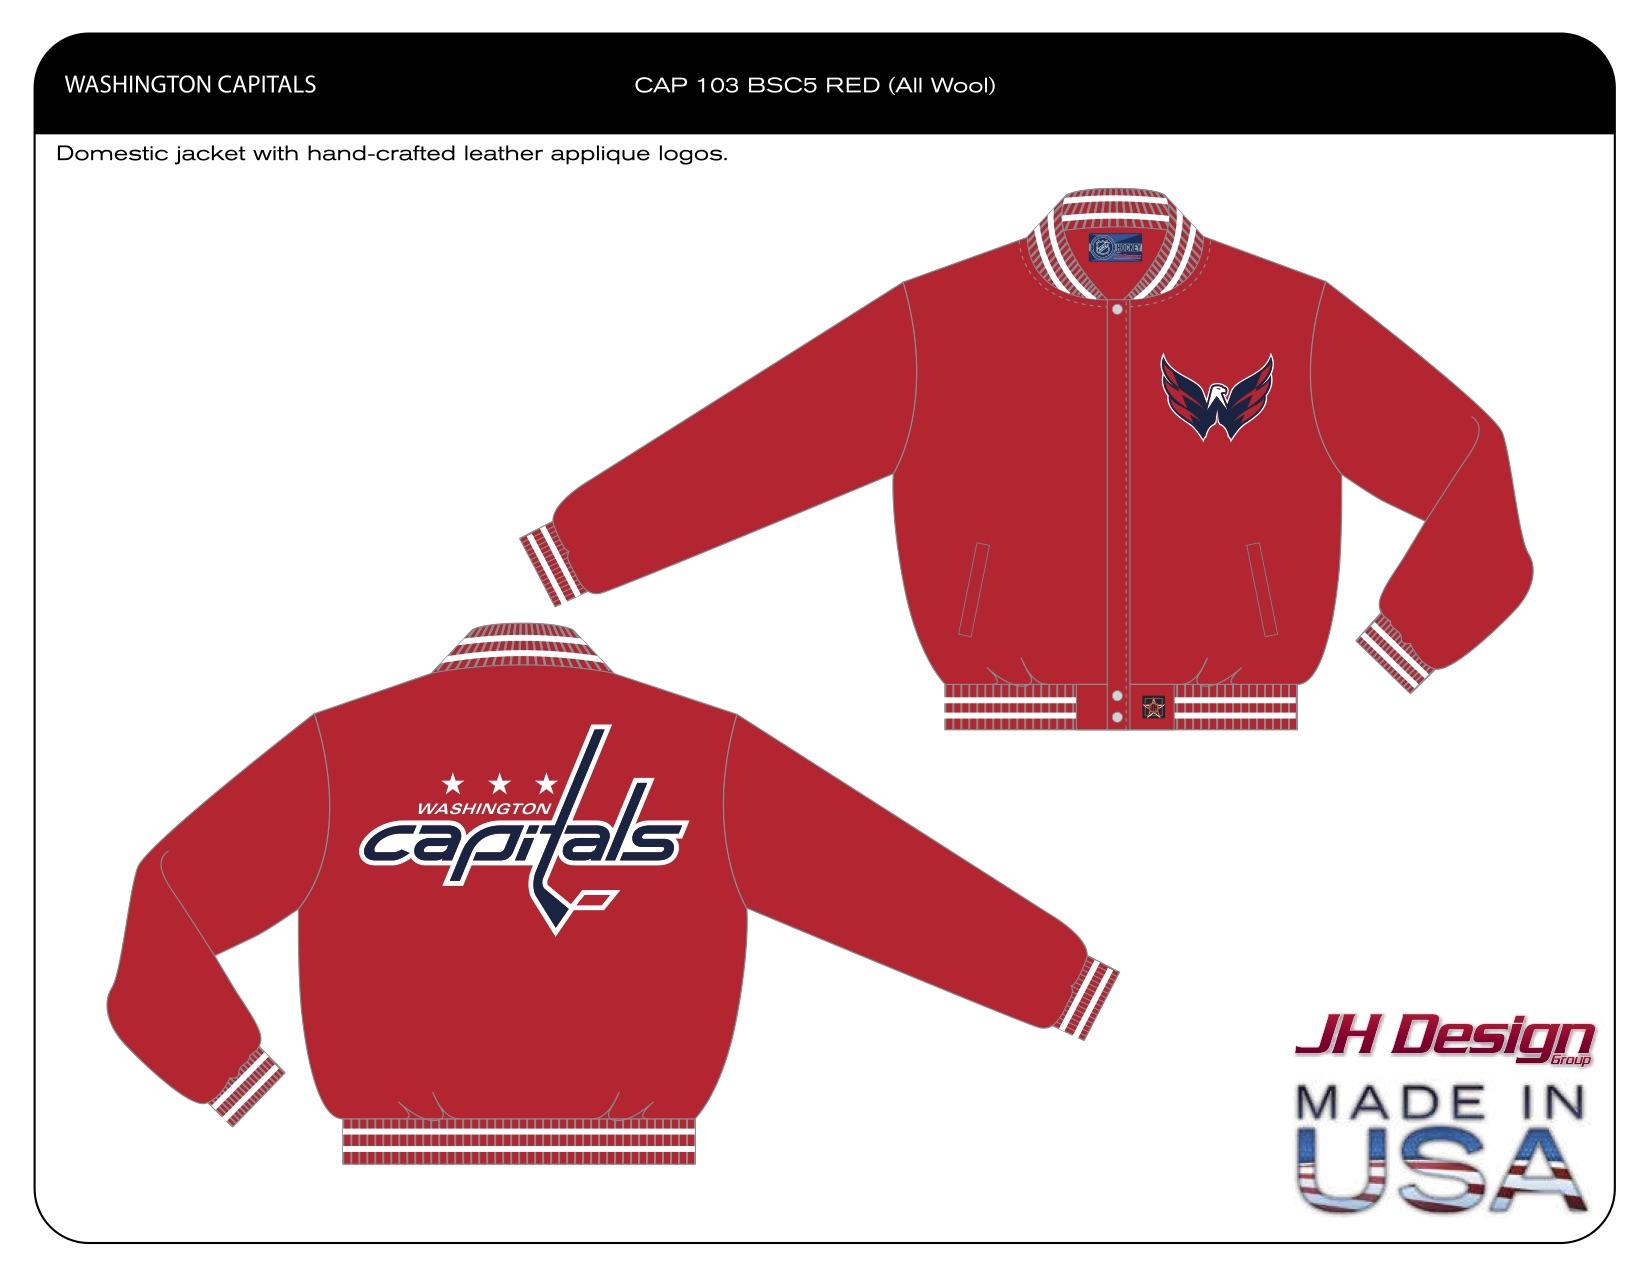 CAP 103 BSC5 RED